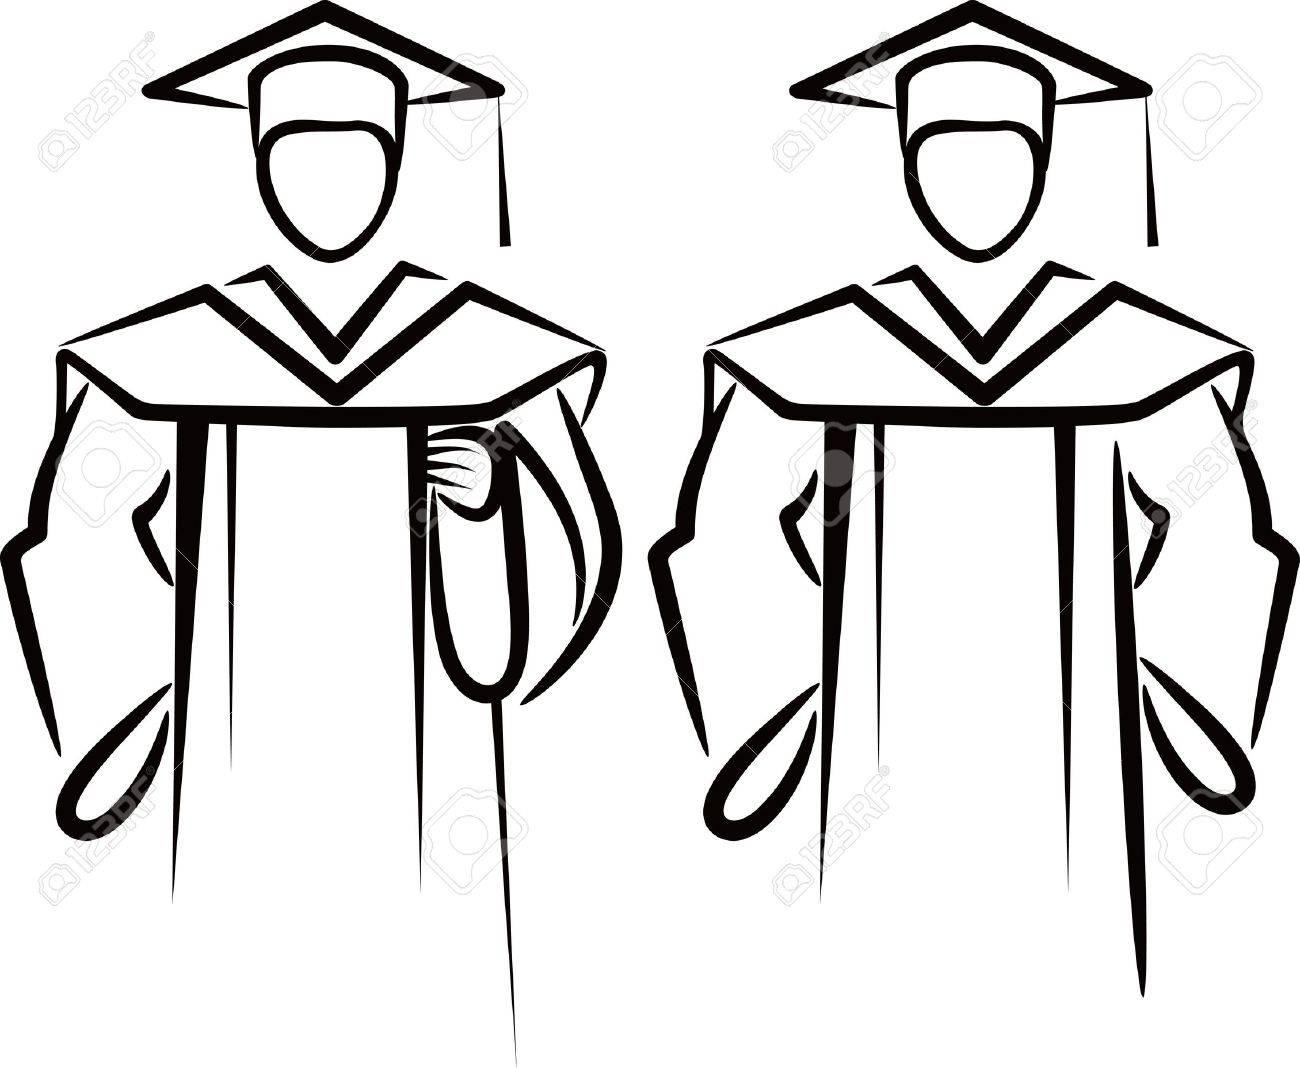 Pics photos how to draw a graduation hat - Graduation Uniform Drawing With A Graduate